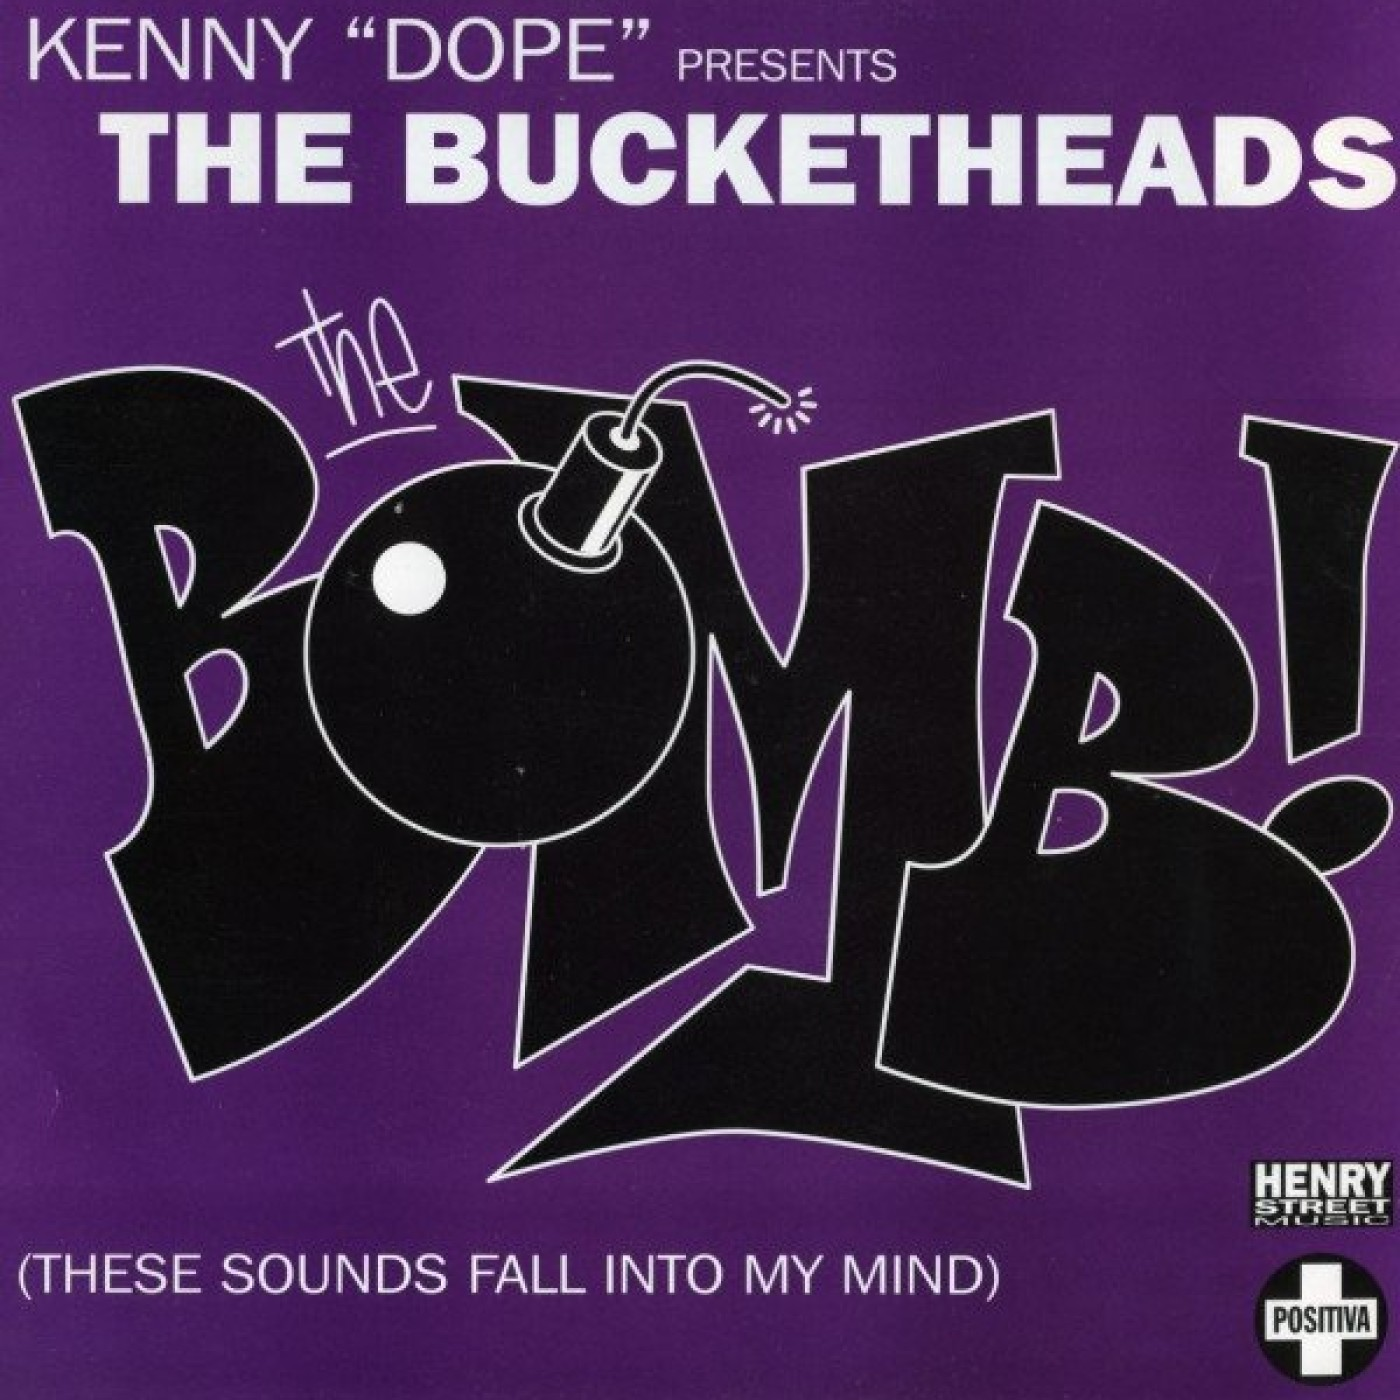 La music story du jour : The Bucketheads